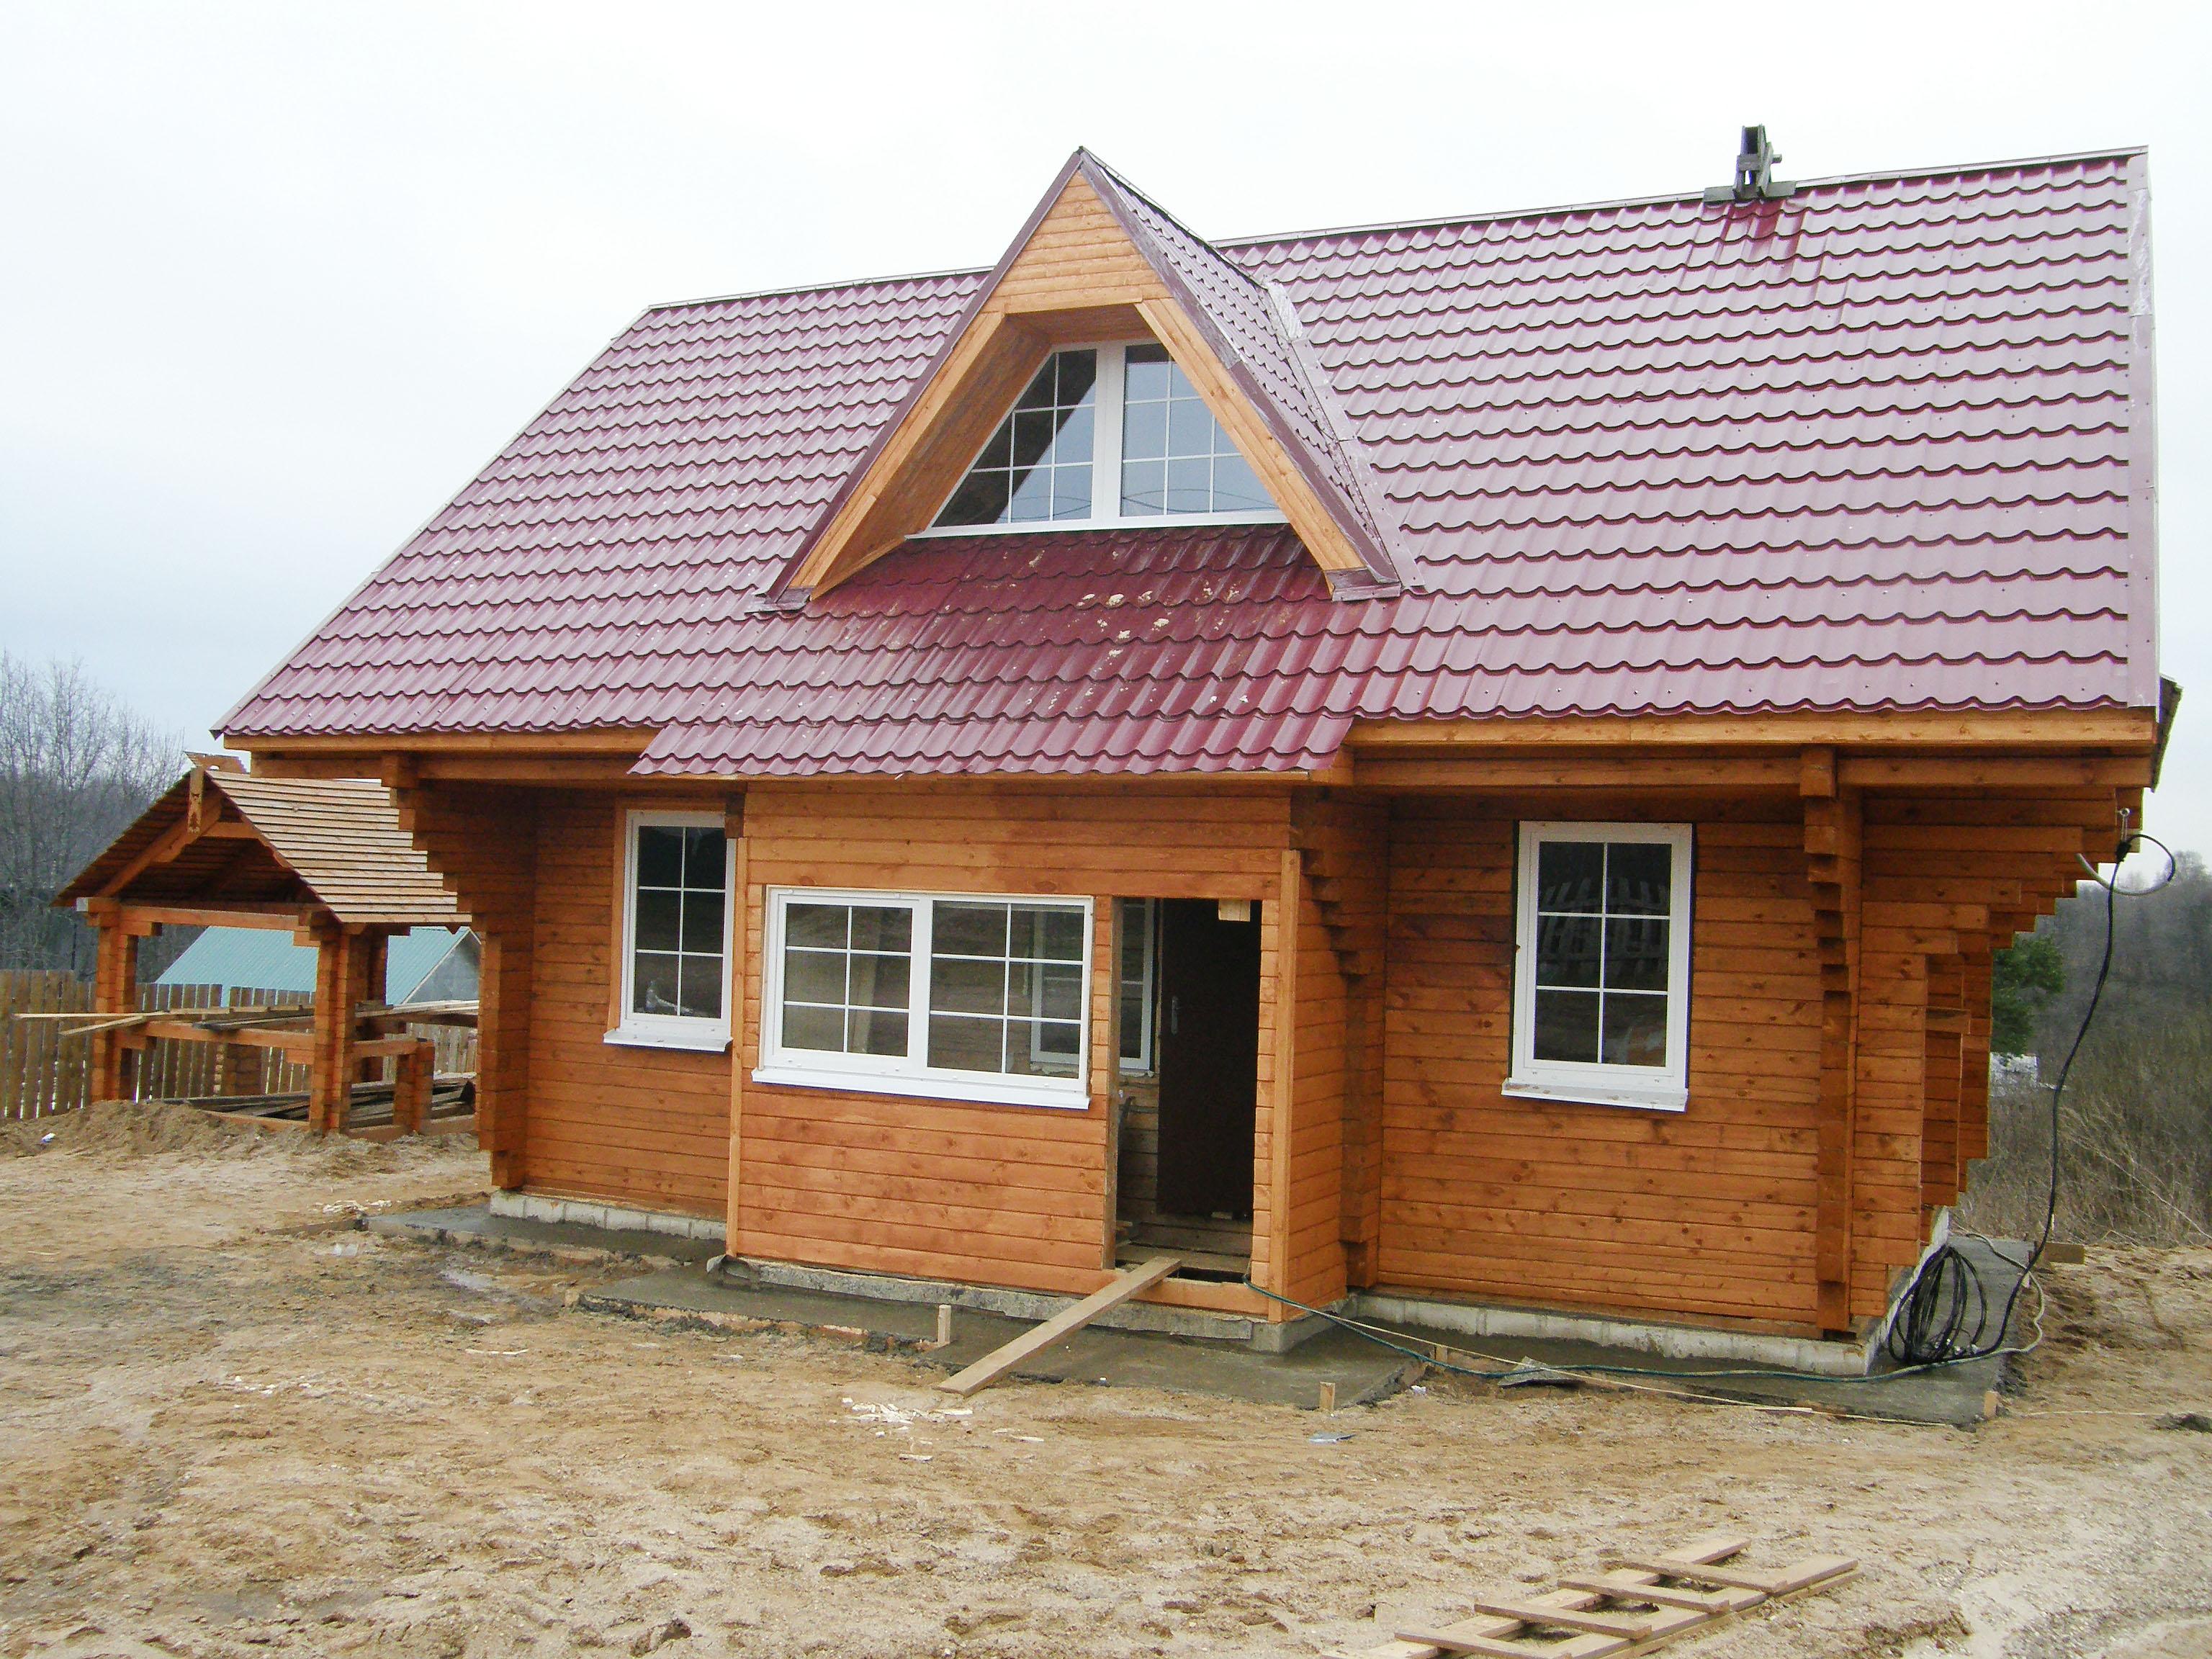 OLYMPUS DIGITAL CAMERA - Дом в поселке Апраксино - nashi-raboty